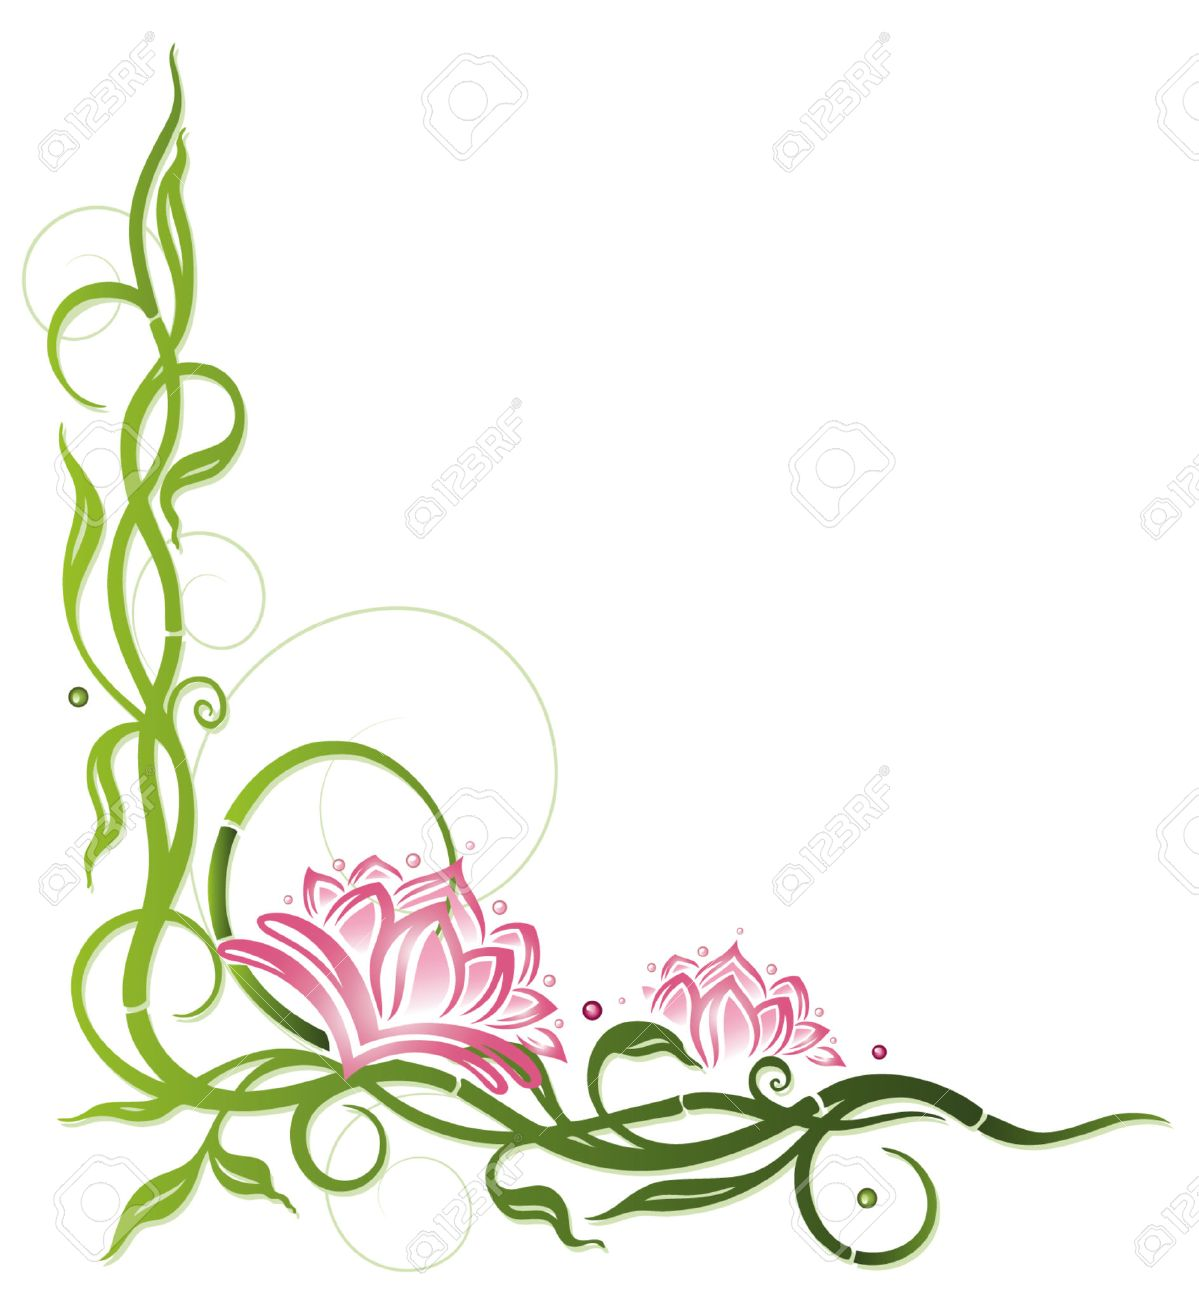 Lotus-Blume mit Bambus-, Wellness-Dekoration Standard-Bild - 27946173